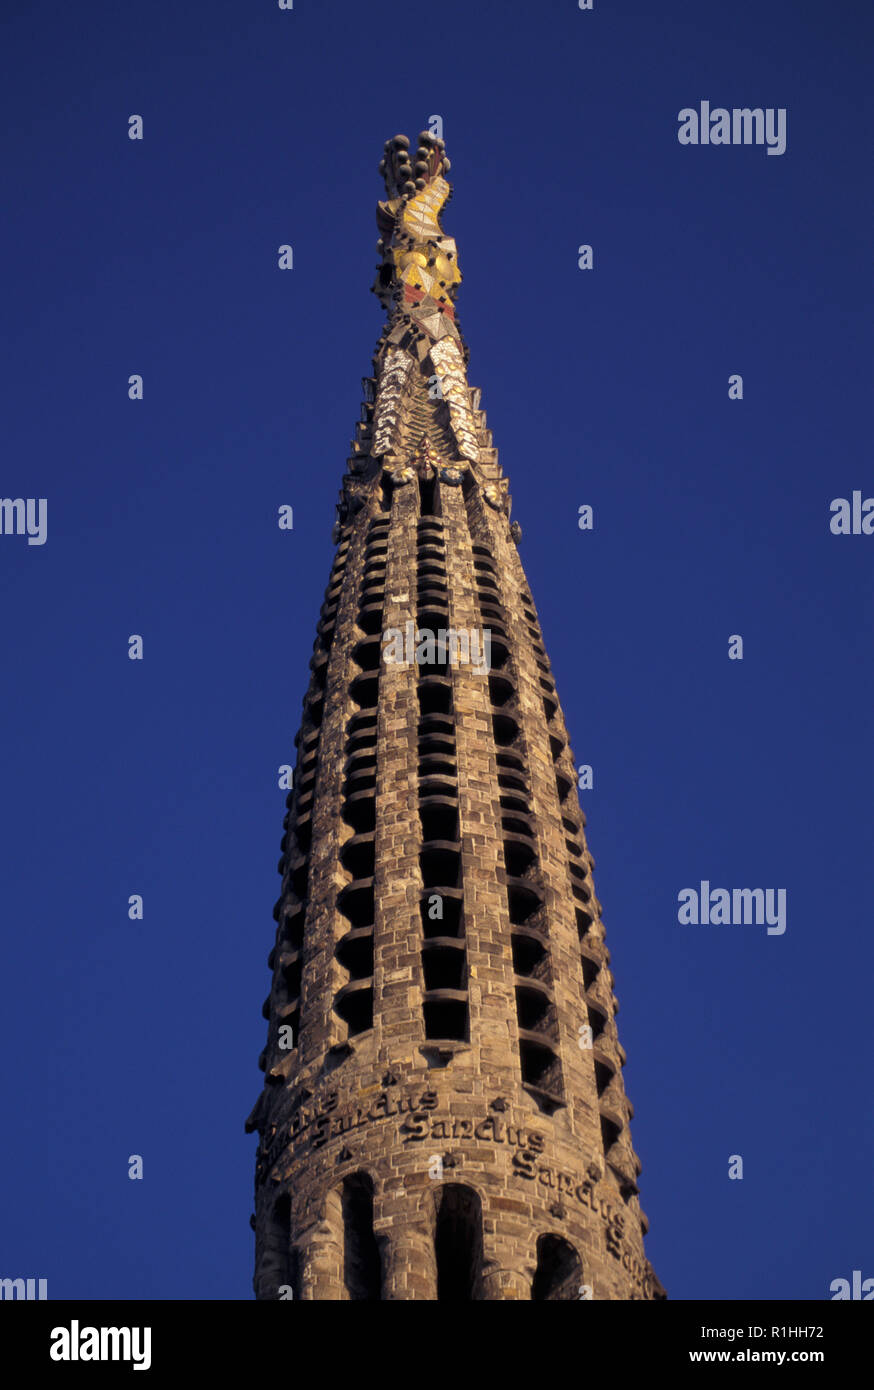 NOT_1128842 SPAIN BARCELONA Sagrada Familia designed by Catalan architect Antoni Gaudí (1852–1926) - Stock Image